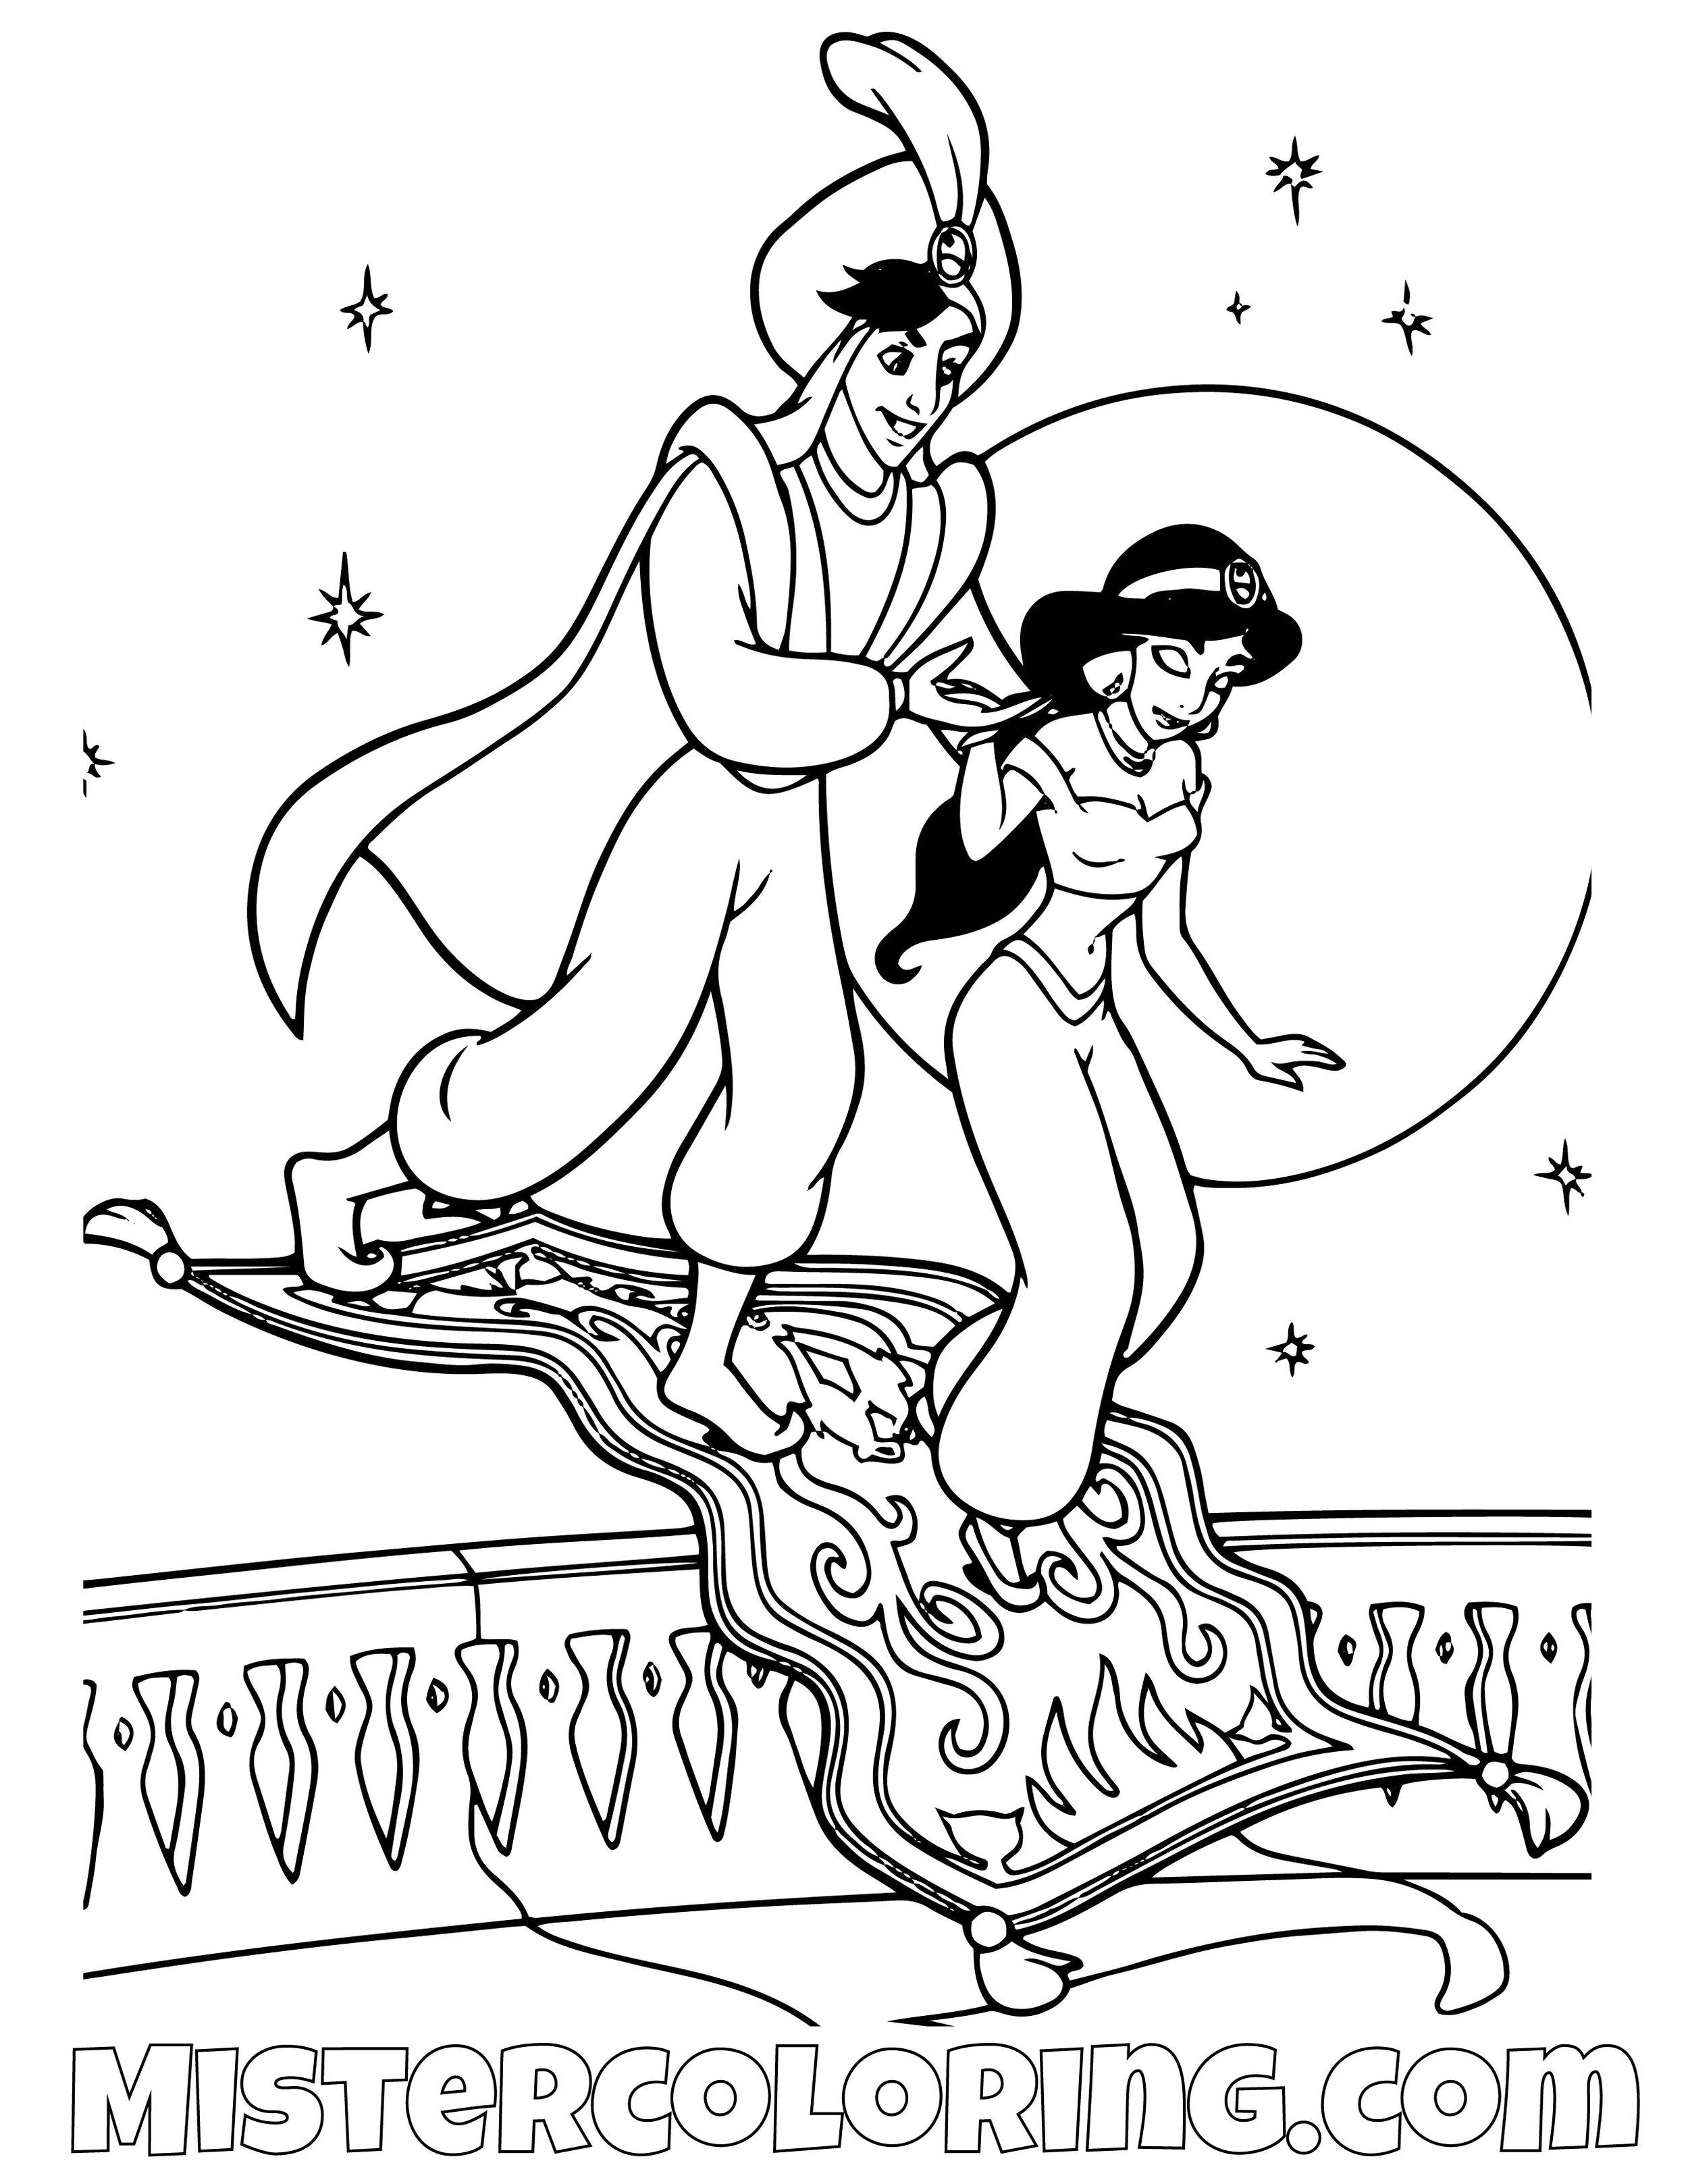 Aladdin Returning Princess Jasmine To Her Palace Aladdin Coloring Page